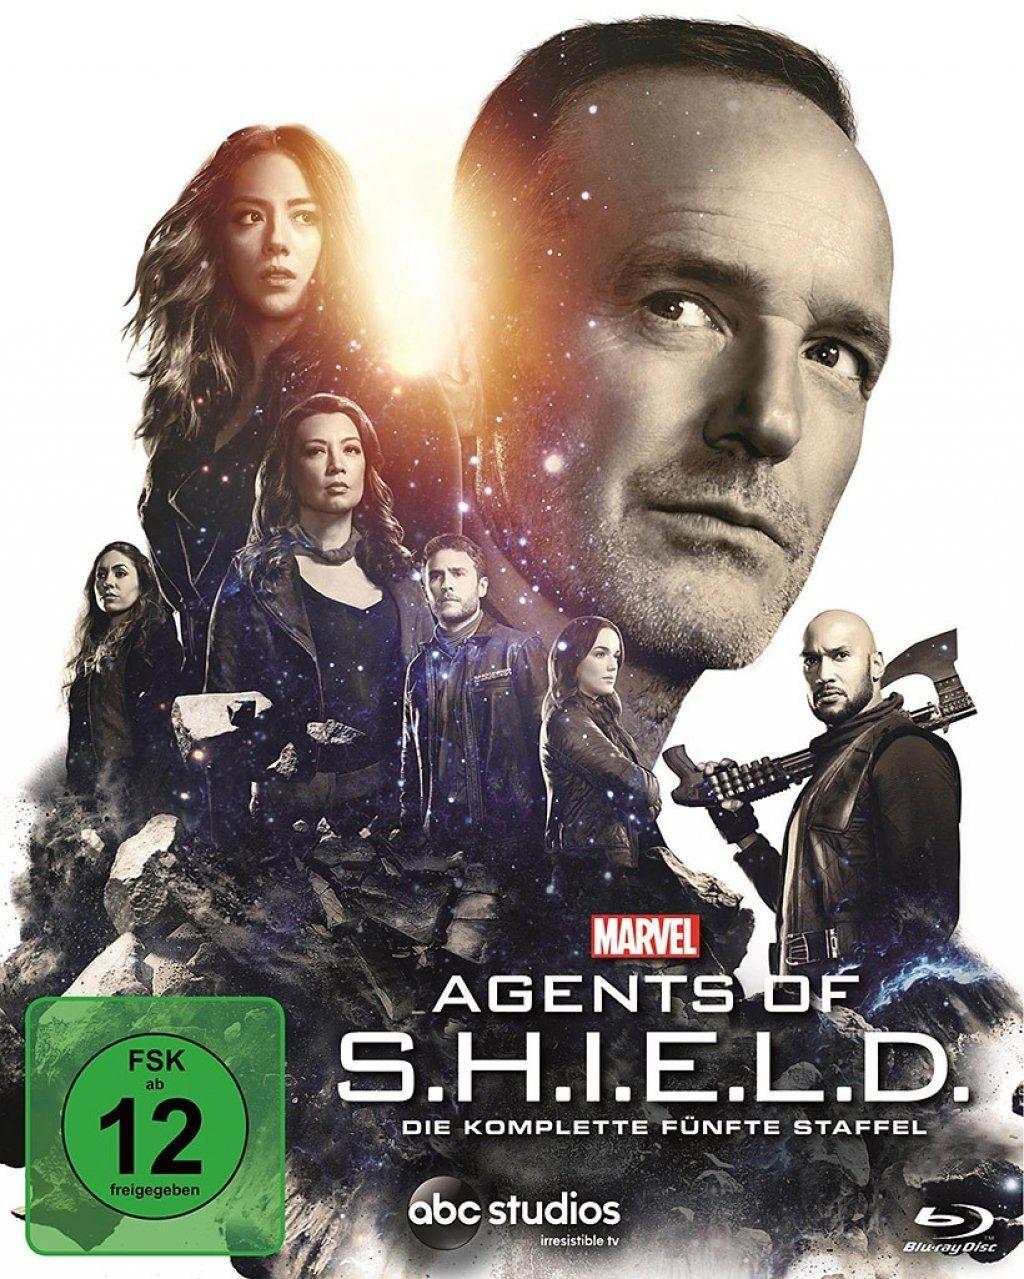 Marvel's Agents of S.H.I.E.L.D. - Die komplette fünfte Staffel (5 Discs) (BLURAY)